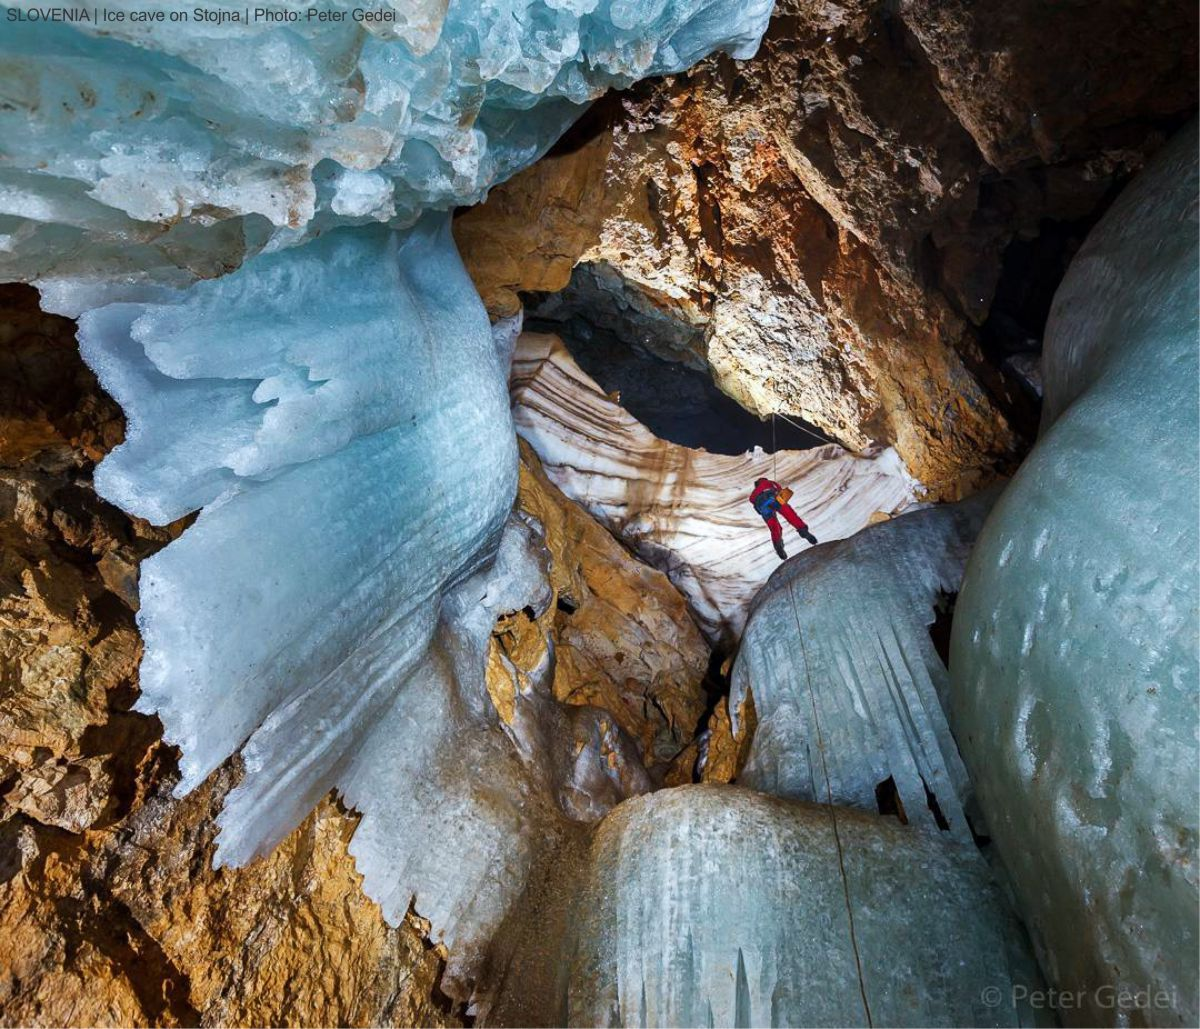 2016-11-05 SLOVENIA - Ice cave on Stojna - Peter Gedei